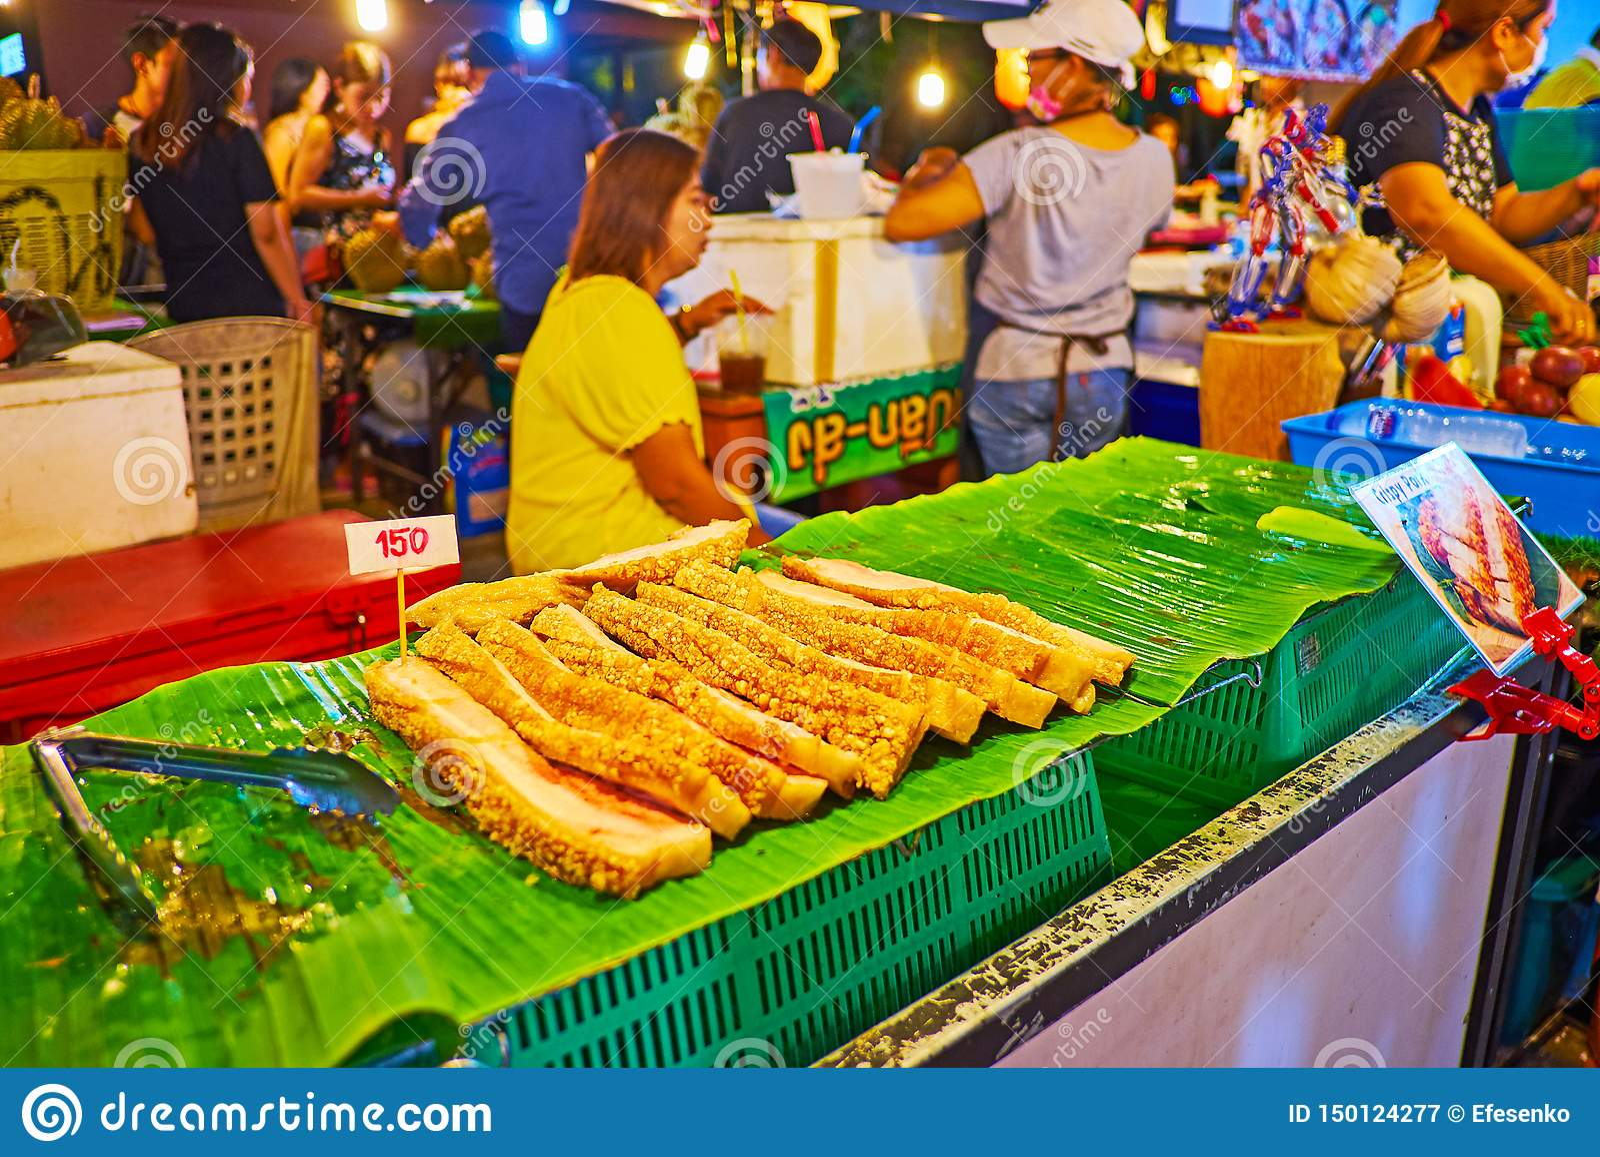 Roasted pork belly in Ao Nang Night Market, Krabi, Thailand